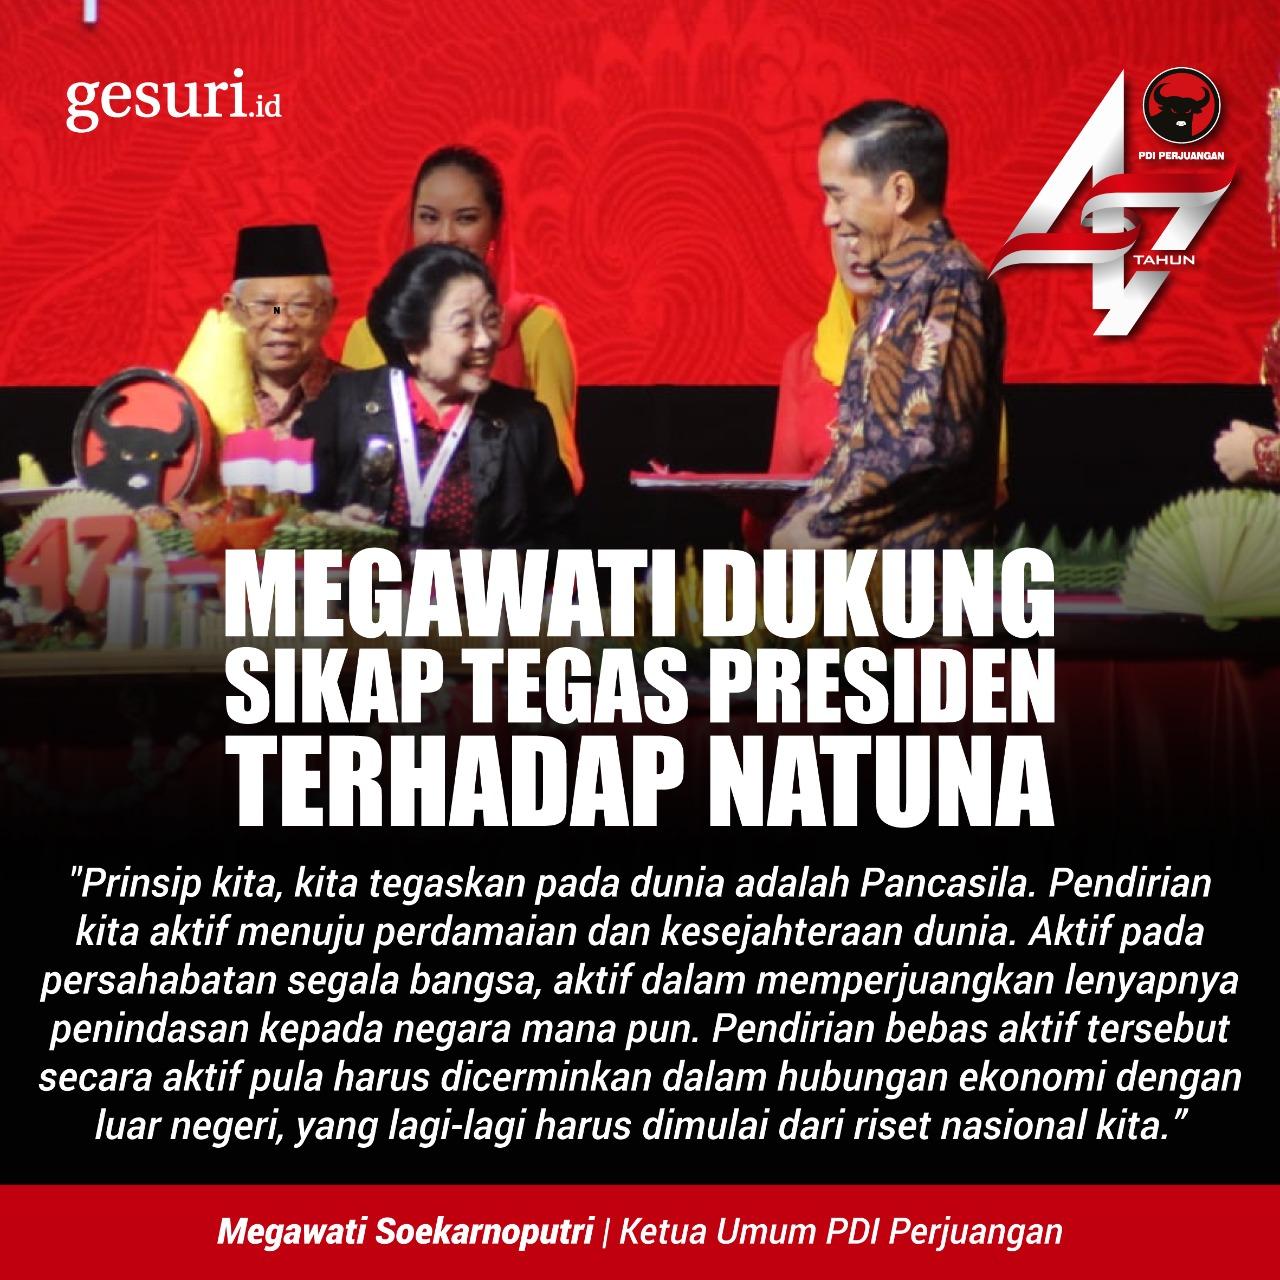 Megawati Dukung Sikap Tegas Presiden Terhadap Natuna